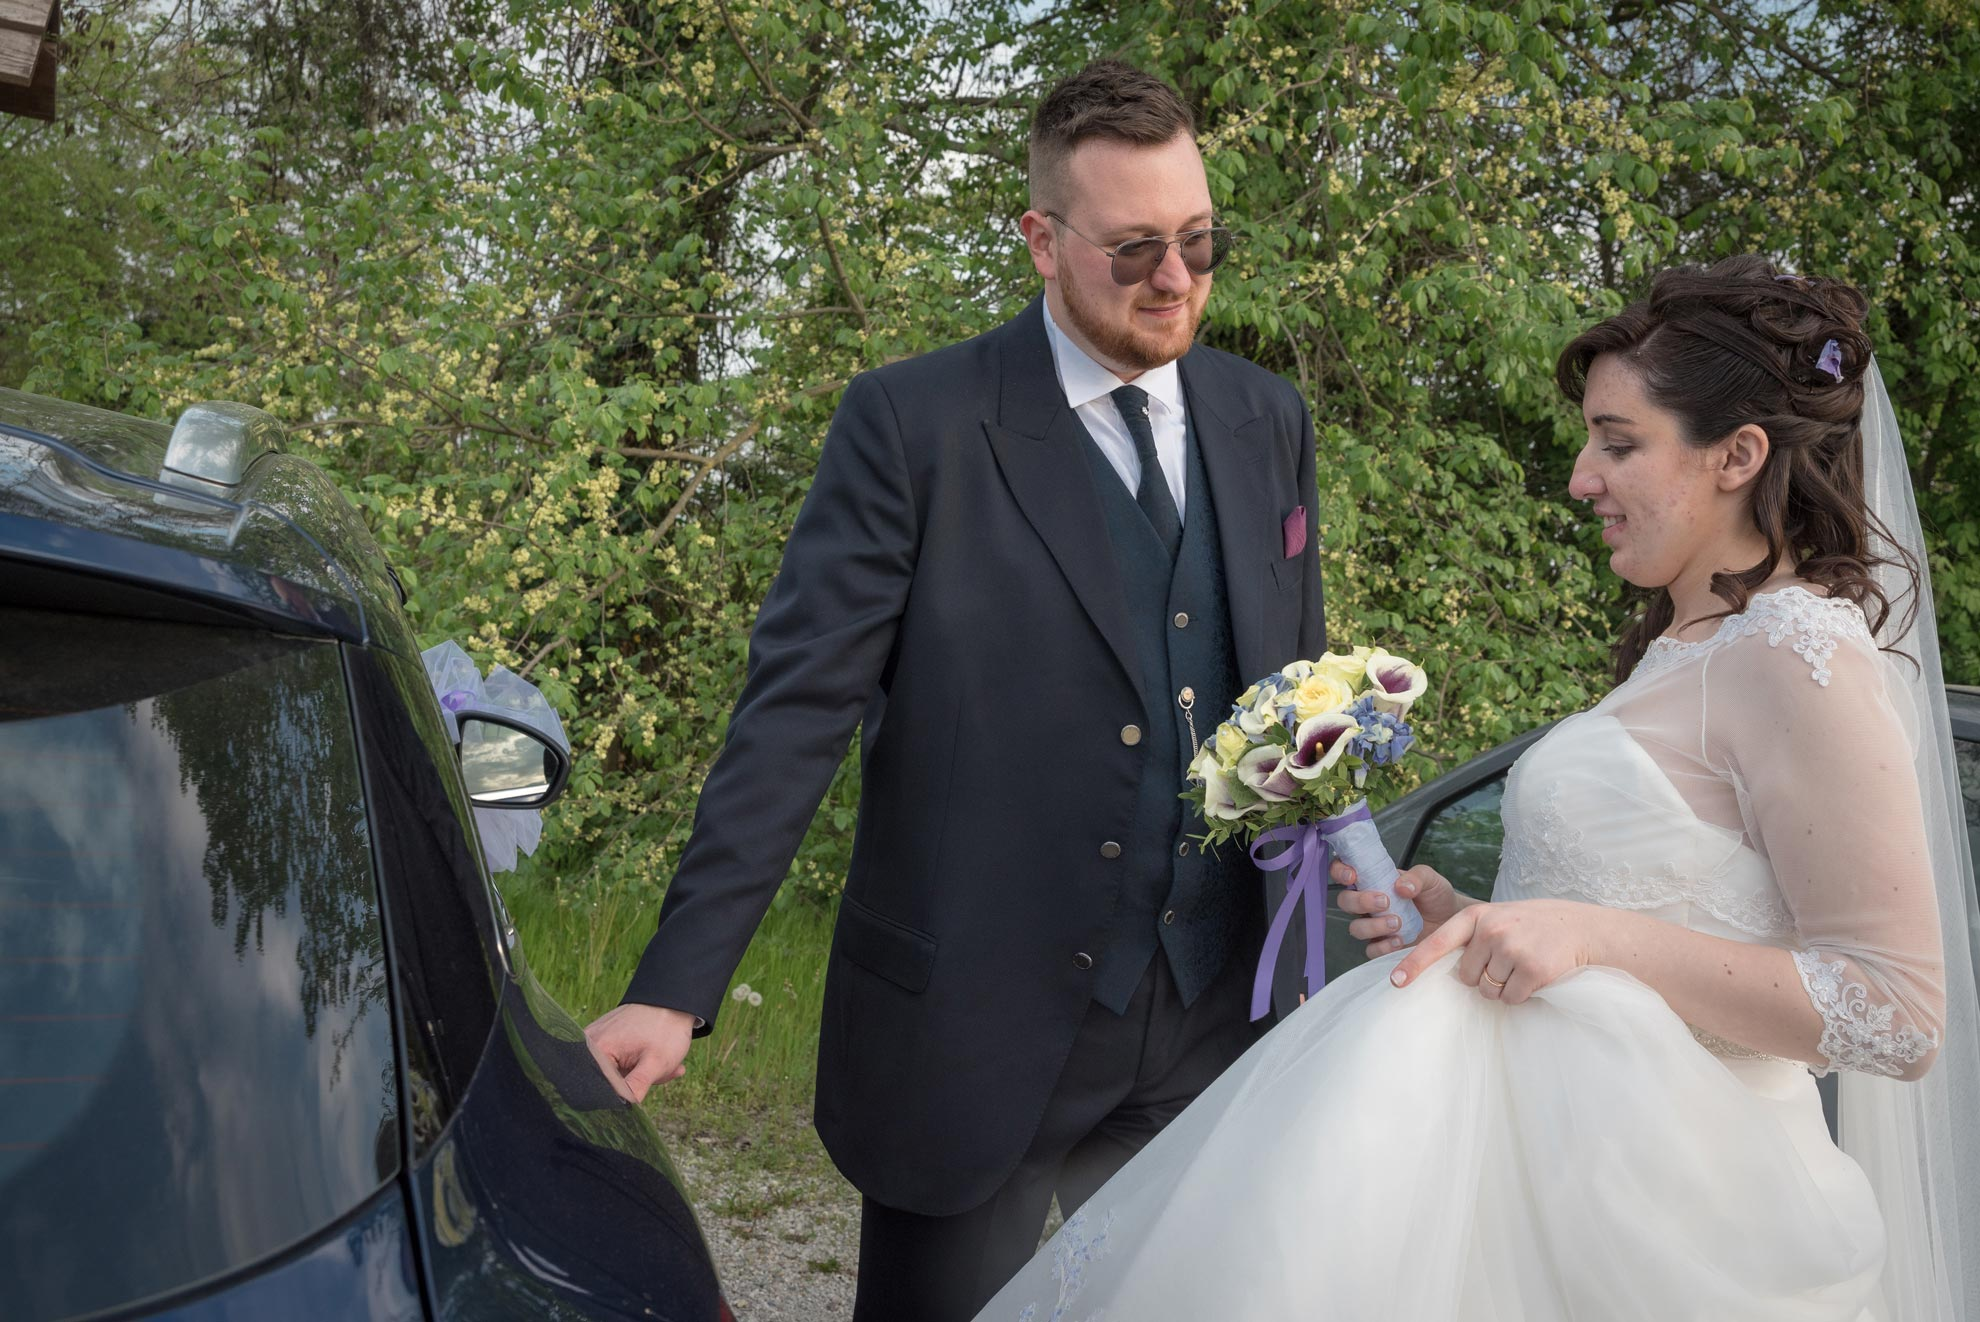 Matrimonio a Narzole Lorenza Diego - DSC 3301 - Fotografo matrimonio Roero - Fotografo matrimonio Roero